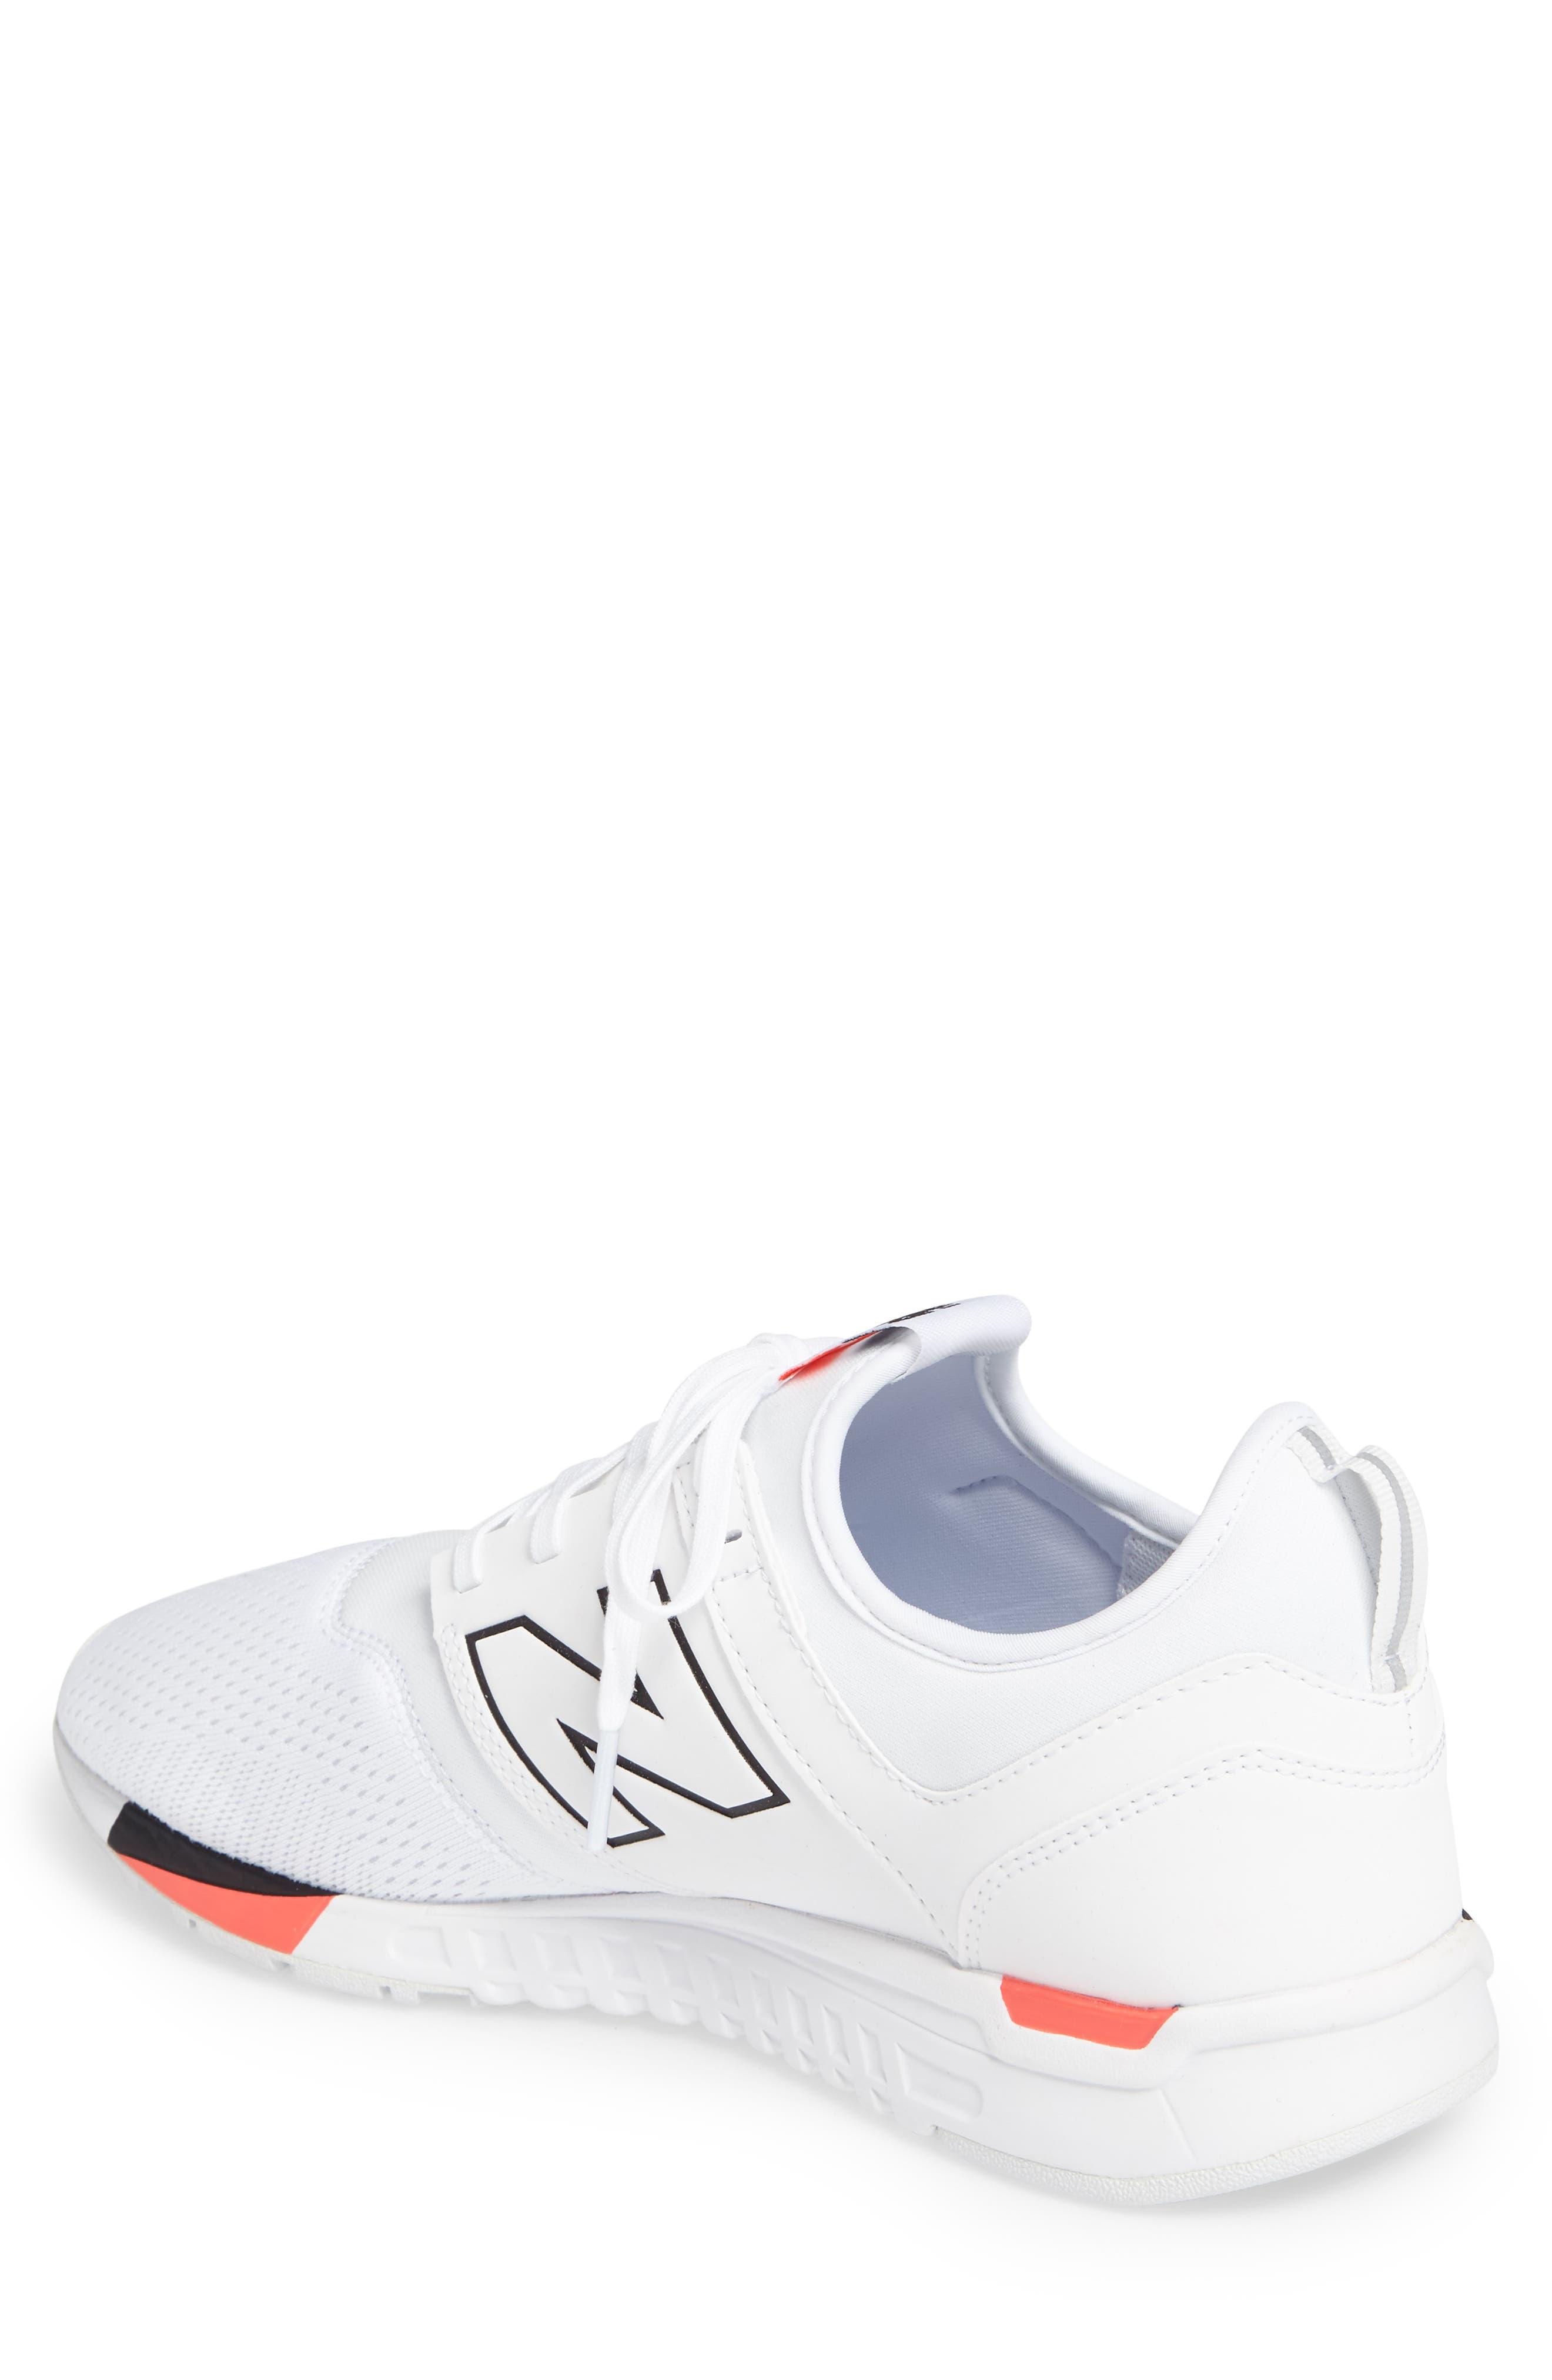 247 Classic Plus Sneaker,                             Alternate thumbnail 2, color,